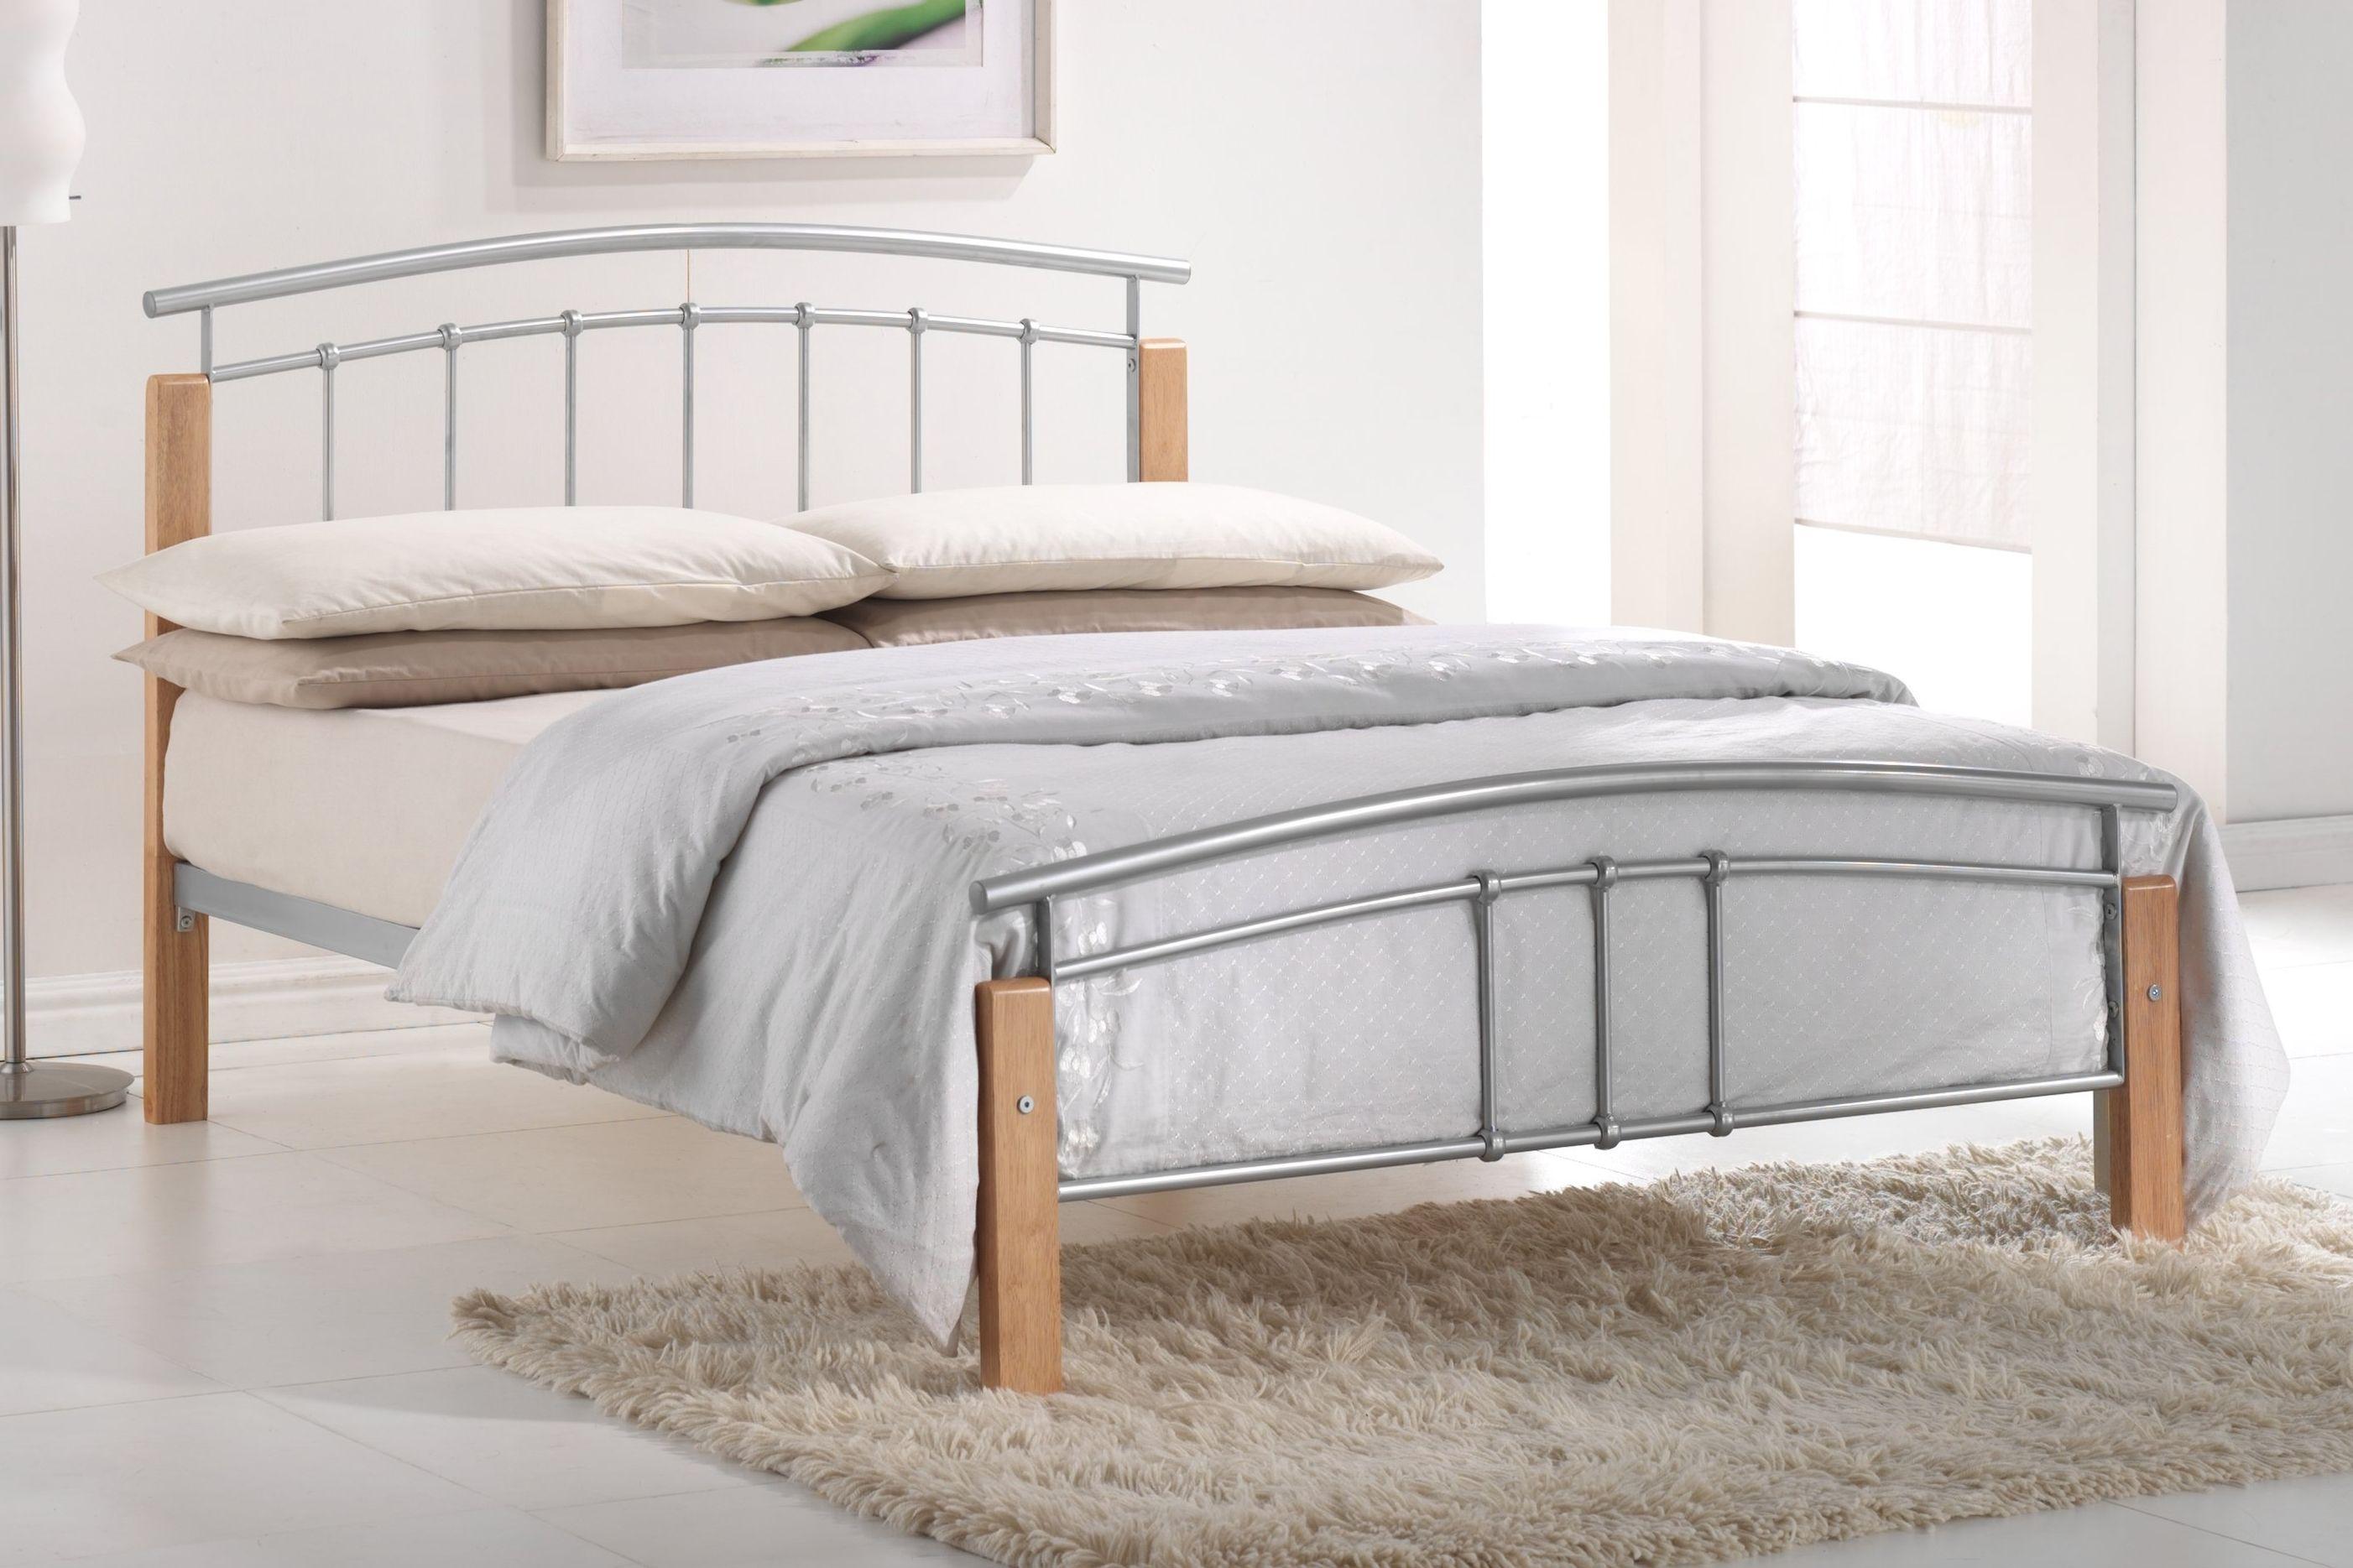 Antik Eisen Bett Rahmen Eisen Kingsize Bett Metall Bett Twin